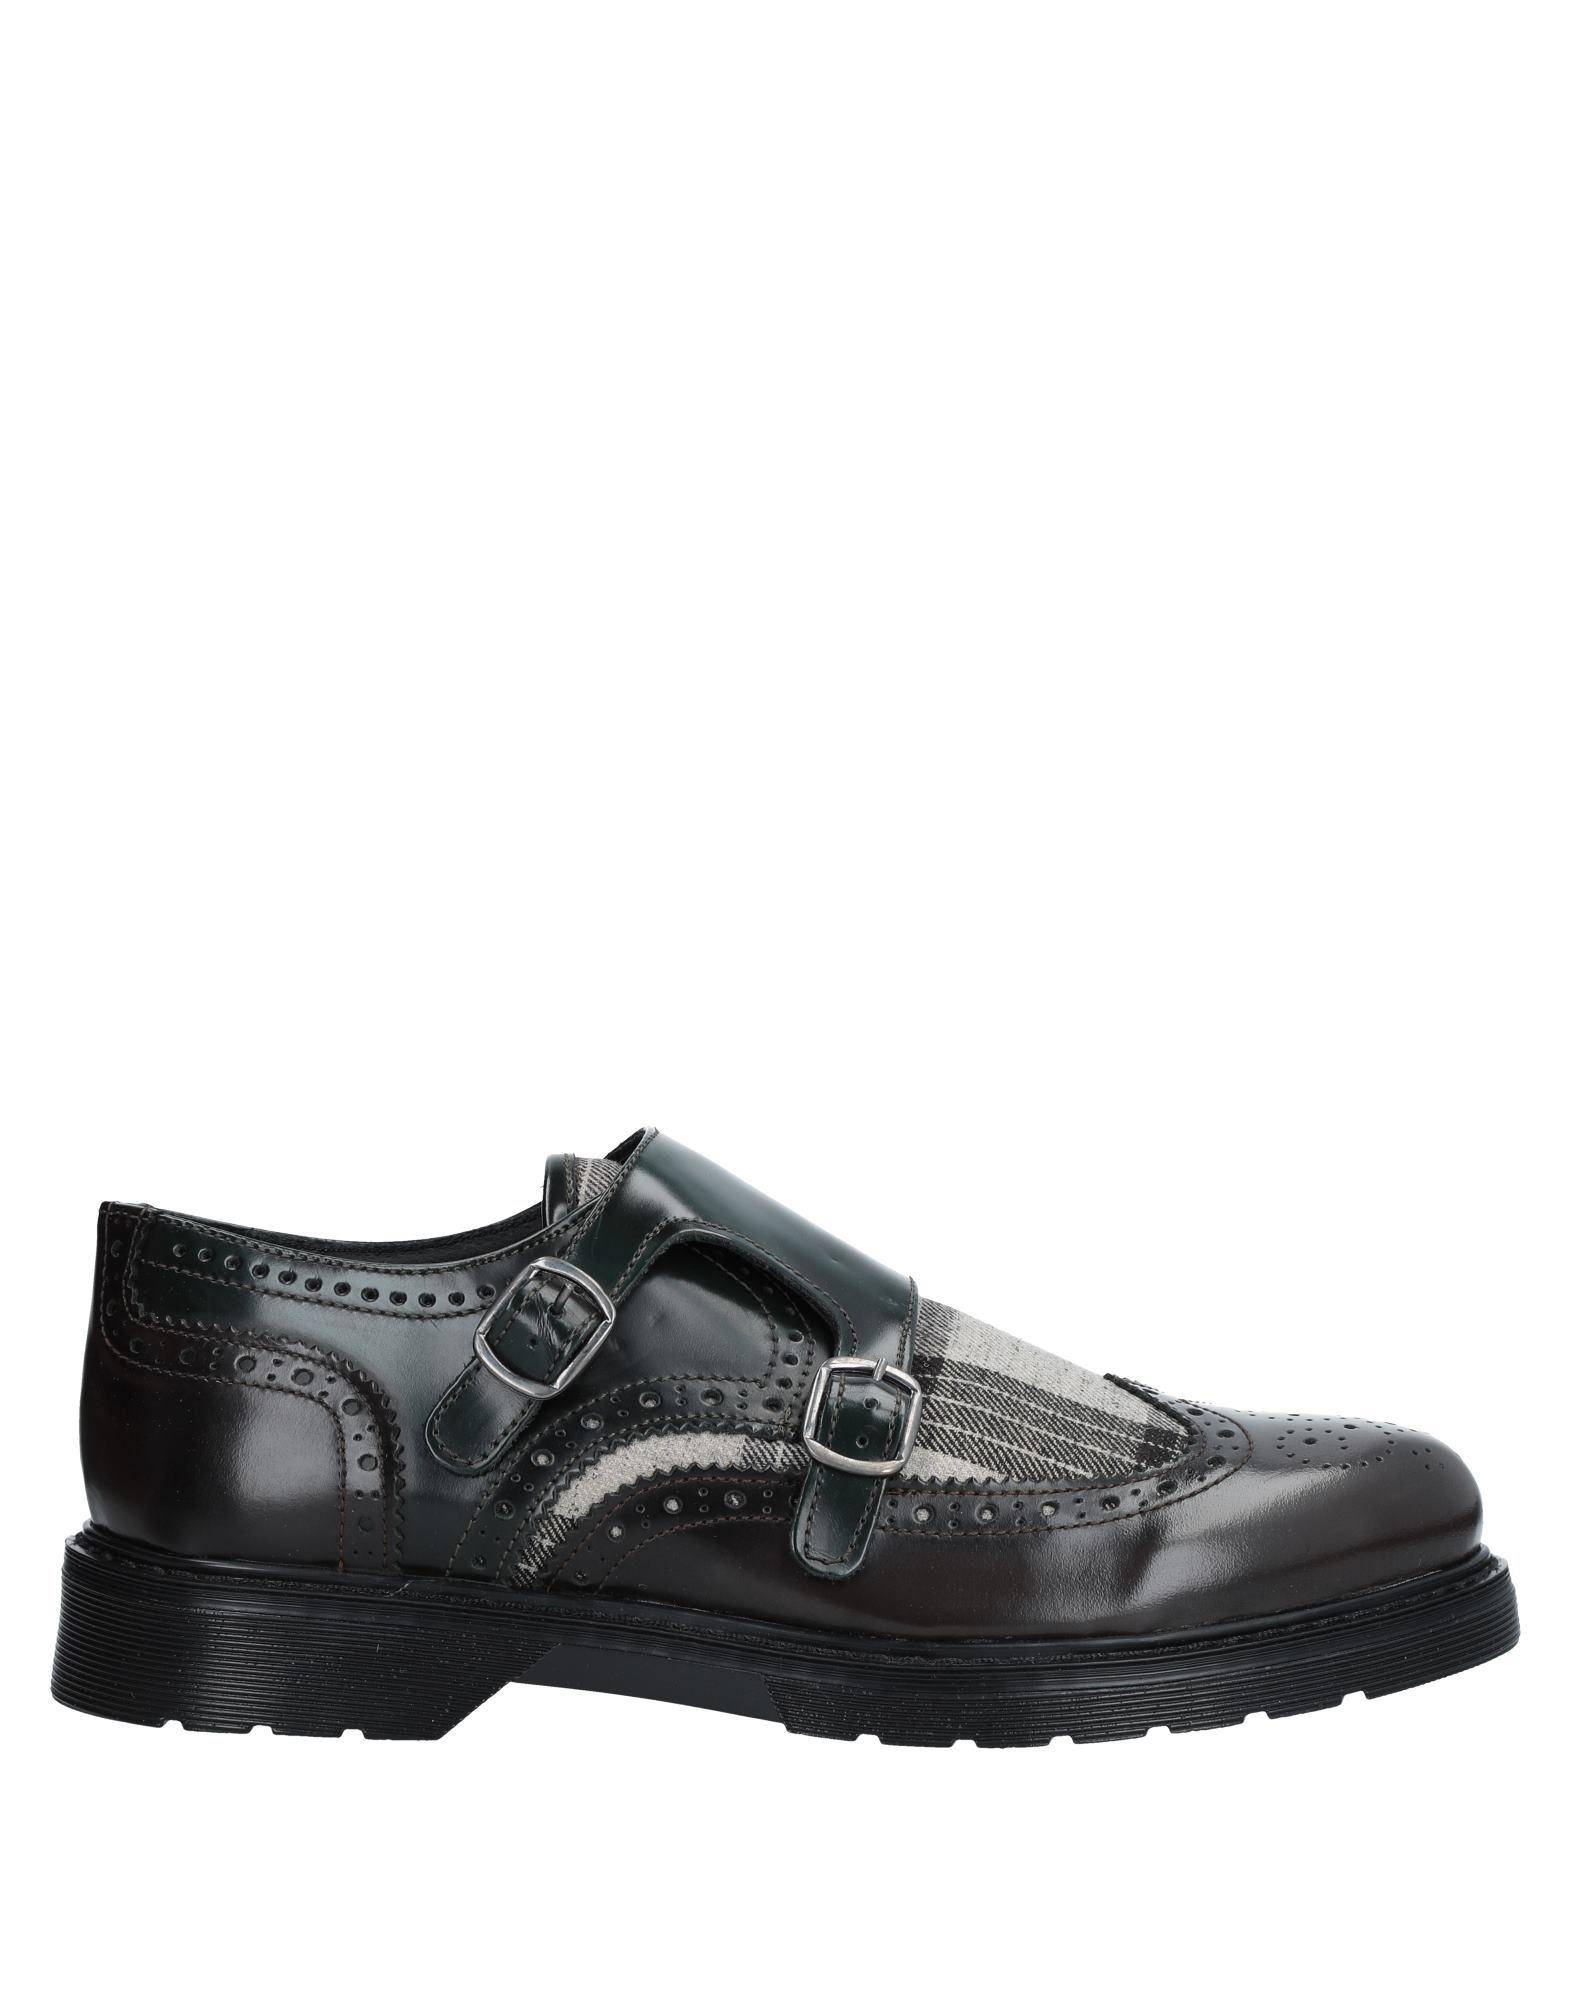 Bottega Marchigiana Mokassins Herren  11541934XL Gute Qualität beliebte Schuhe